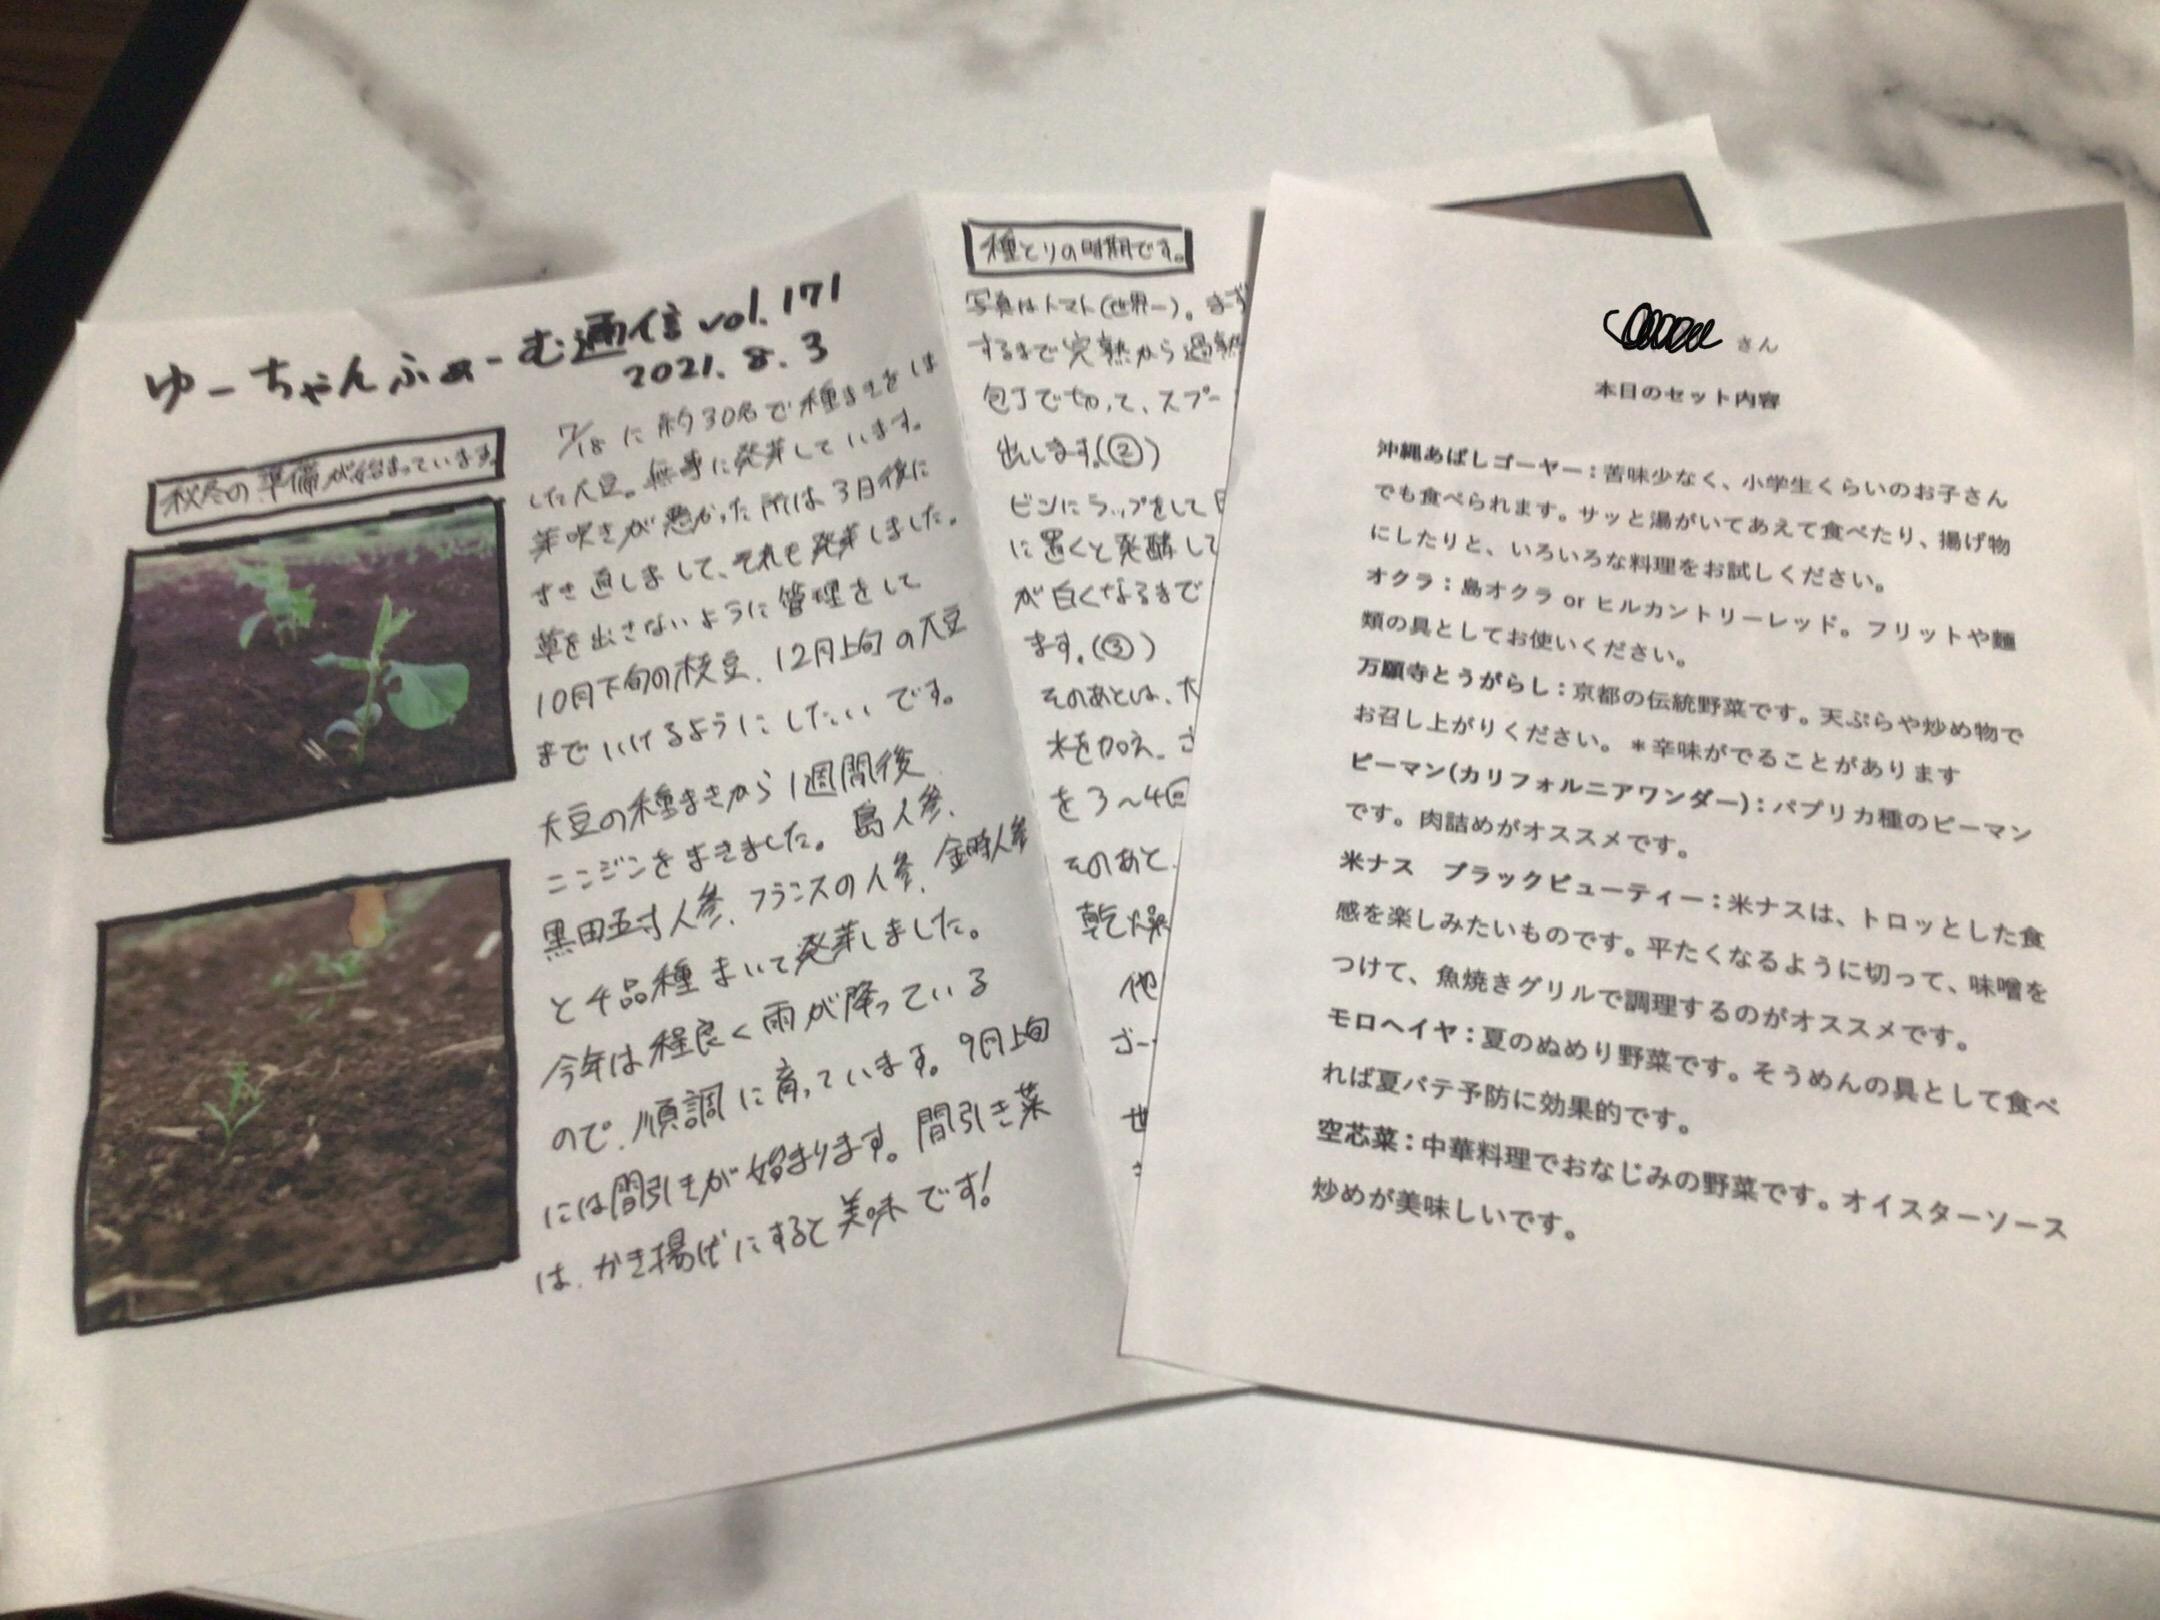 【SDGs×超簡単お料理アイデア】産地直送農産物を楽しめる食べチョクお野菜で☆_5